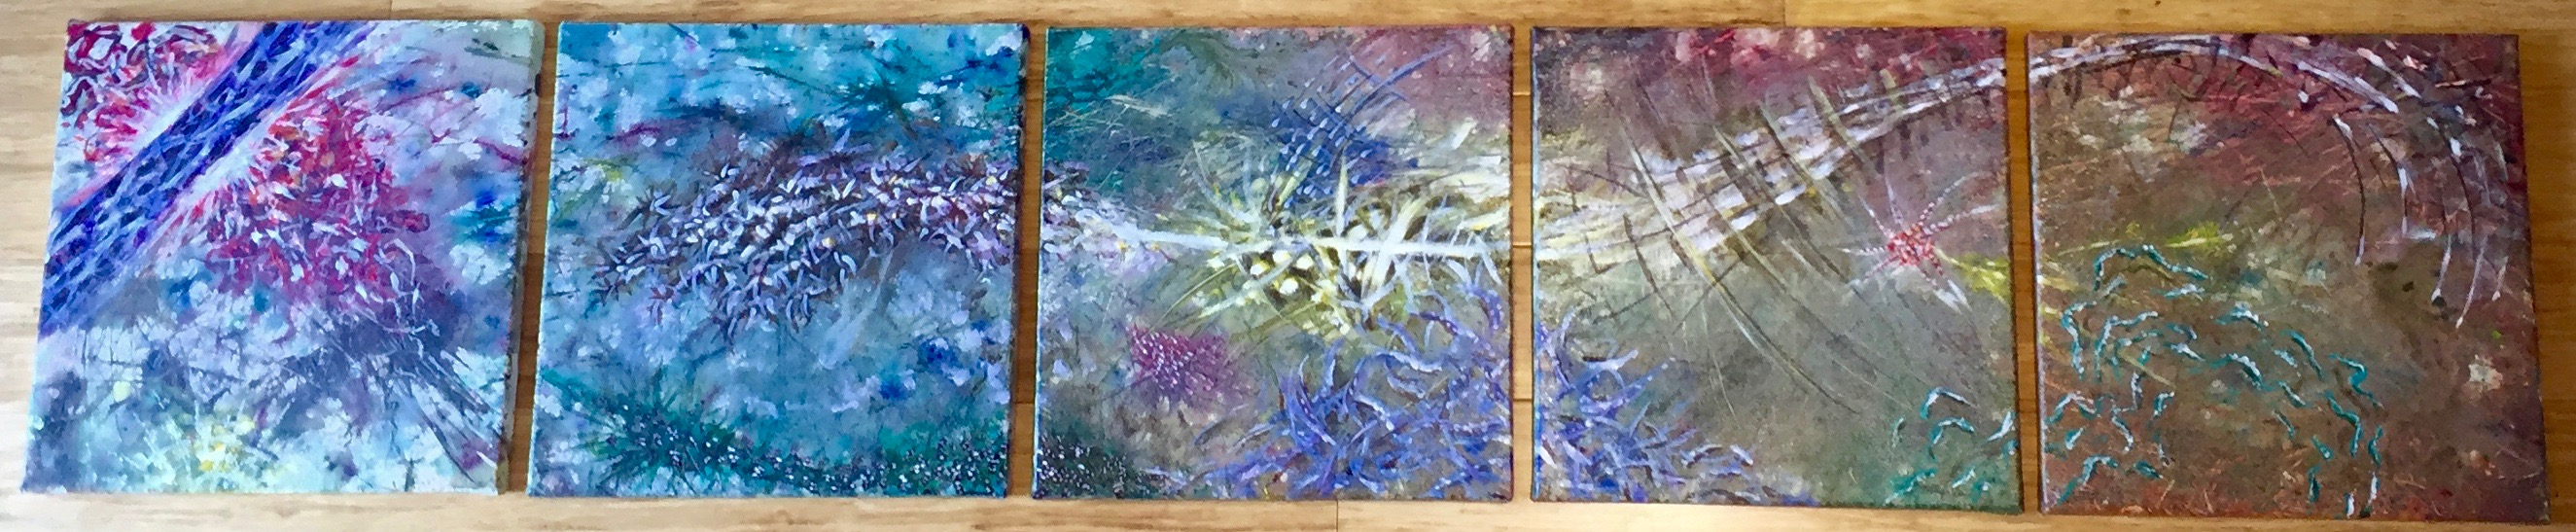 Pandoras Cluster artwork by Joel Cleveland - art listed for sale on Artplode